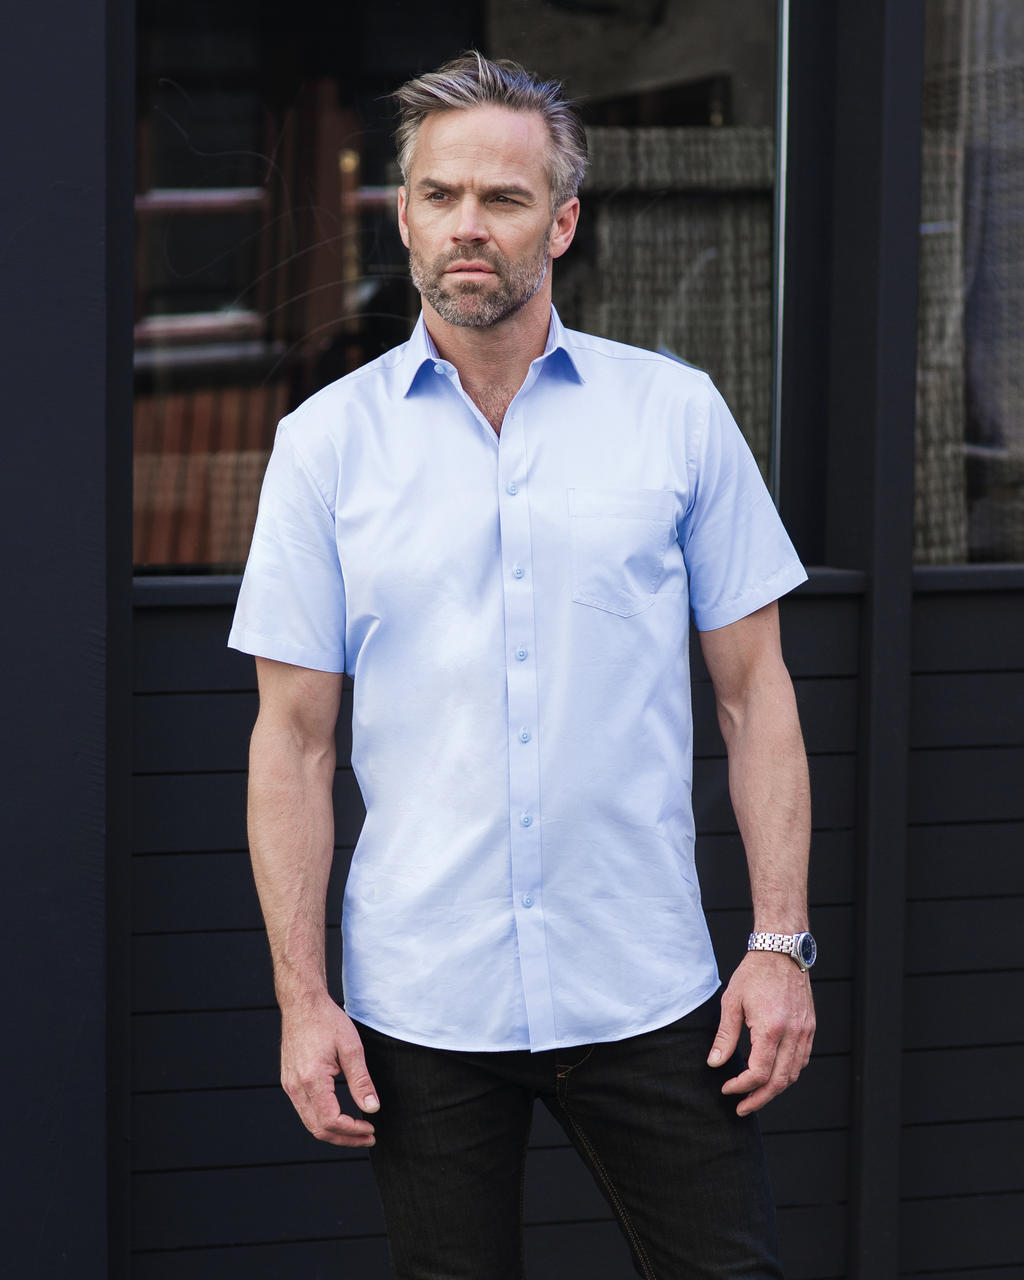 Russell Collection Pánská košile s kr.ruk. Tailored Coolmax® Barva: White, Velikost: S